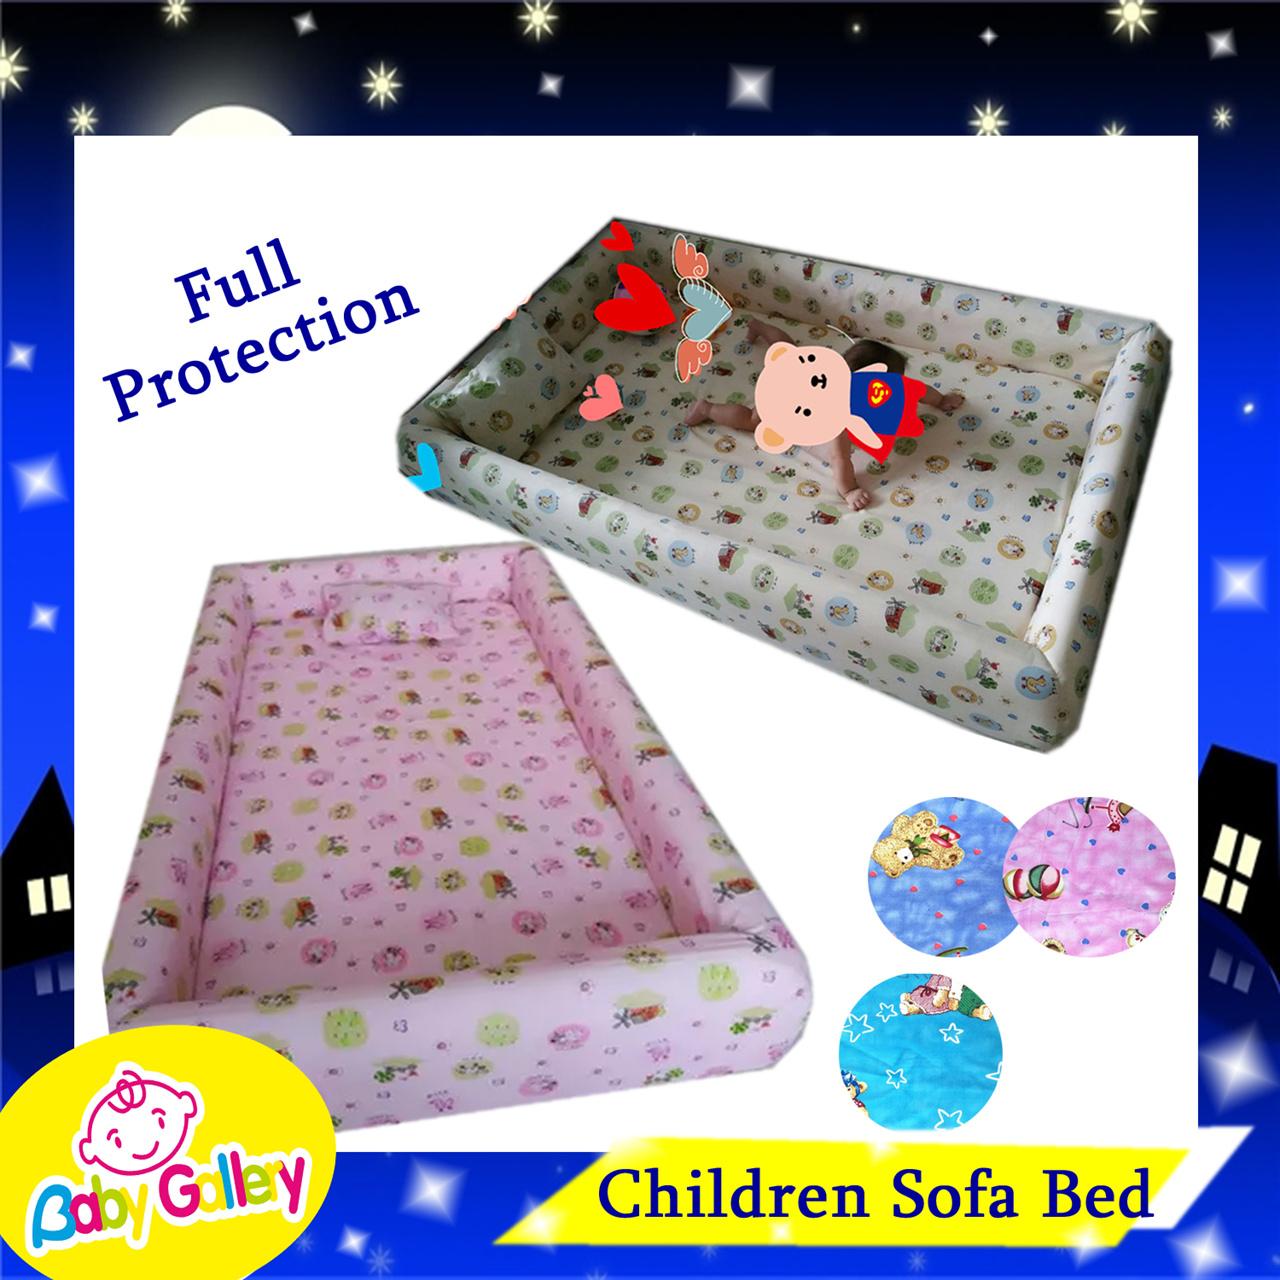 Buy Toddler Bed Baby Sofa Bed Kids Children Bed Full